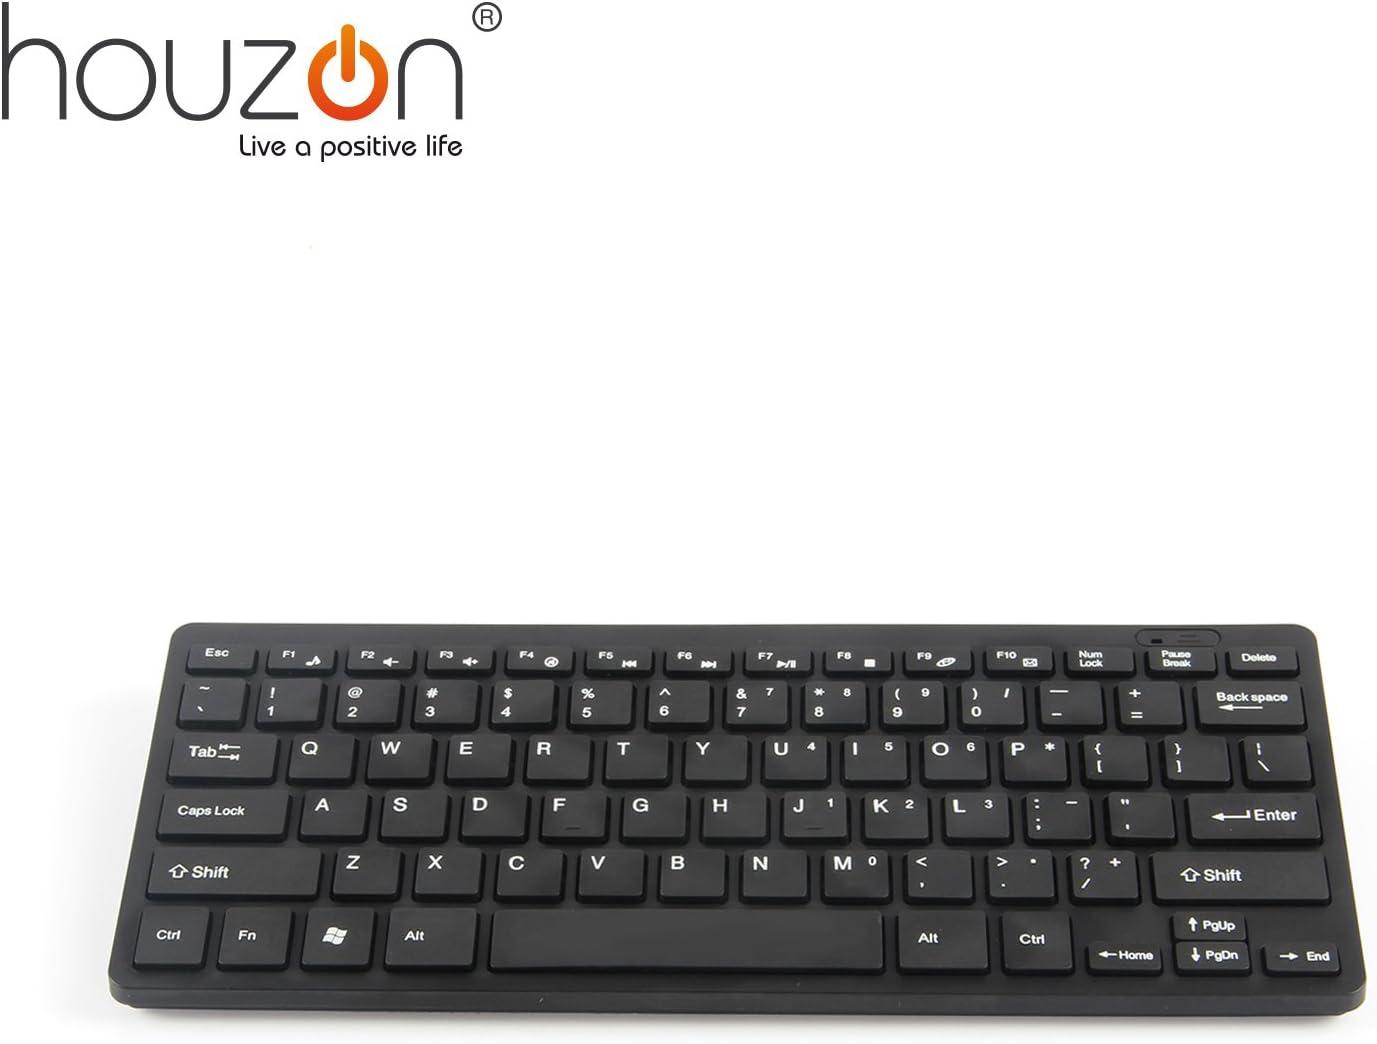 HOUZON® Mini Teclado y Ratón Inalámbricos 2.4G Para PC Portátil - Negro